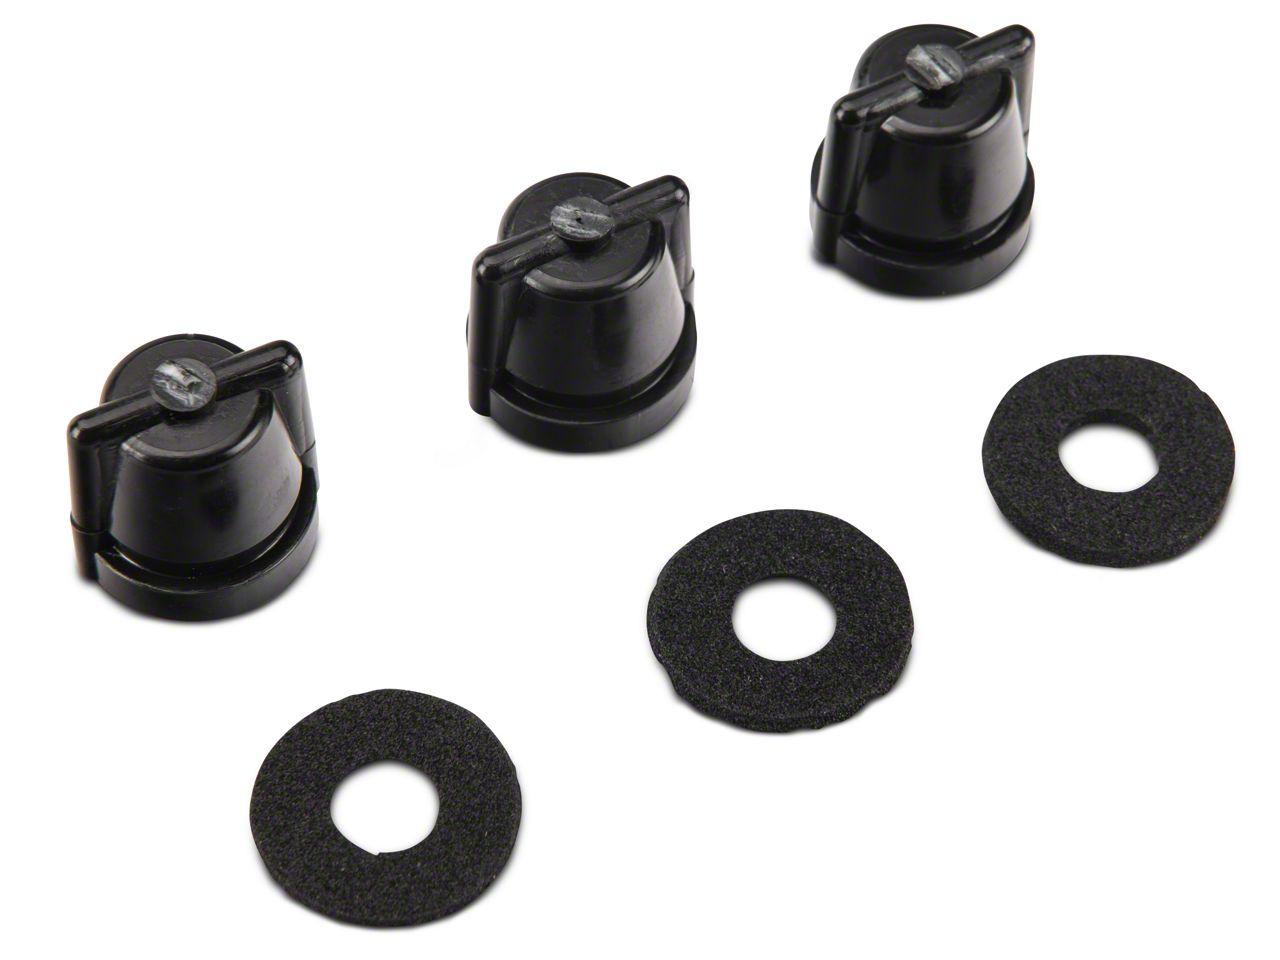 OPR Wiper Pivot Linkage Bushing Repair Kit (79-04 All)